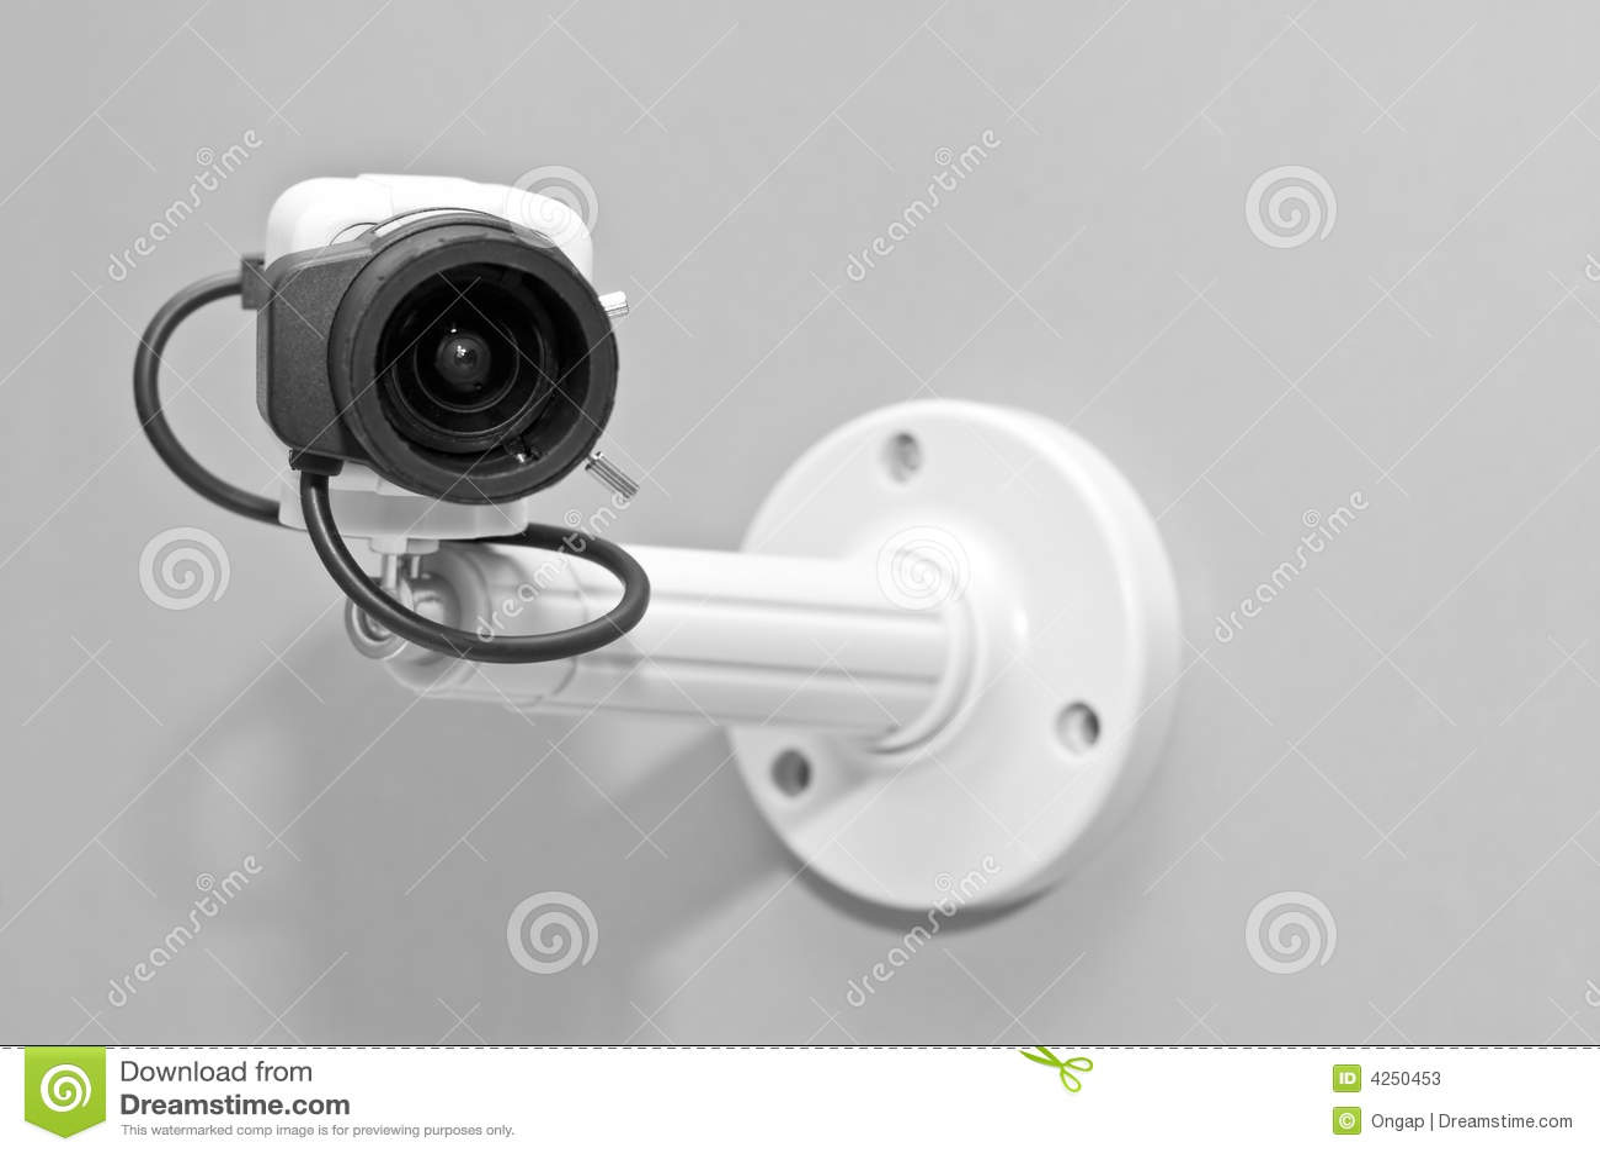 Cctv camera stock image  Image of optical, guard, video